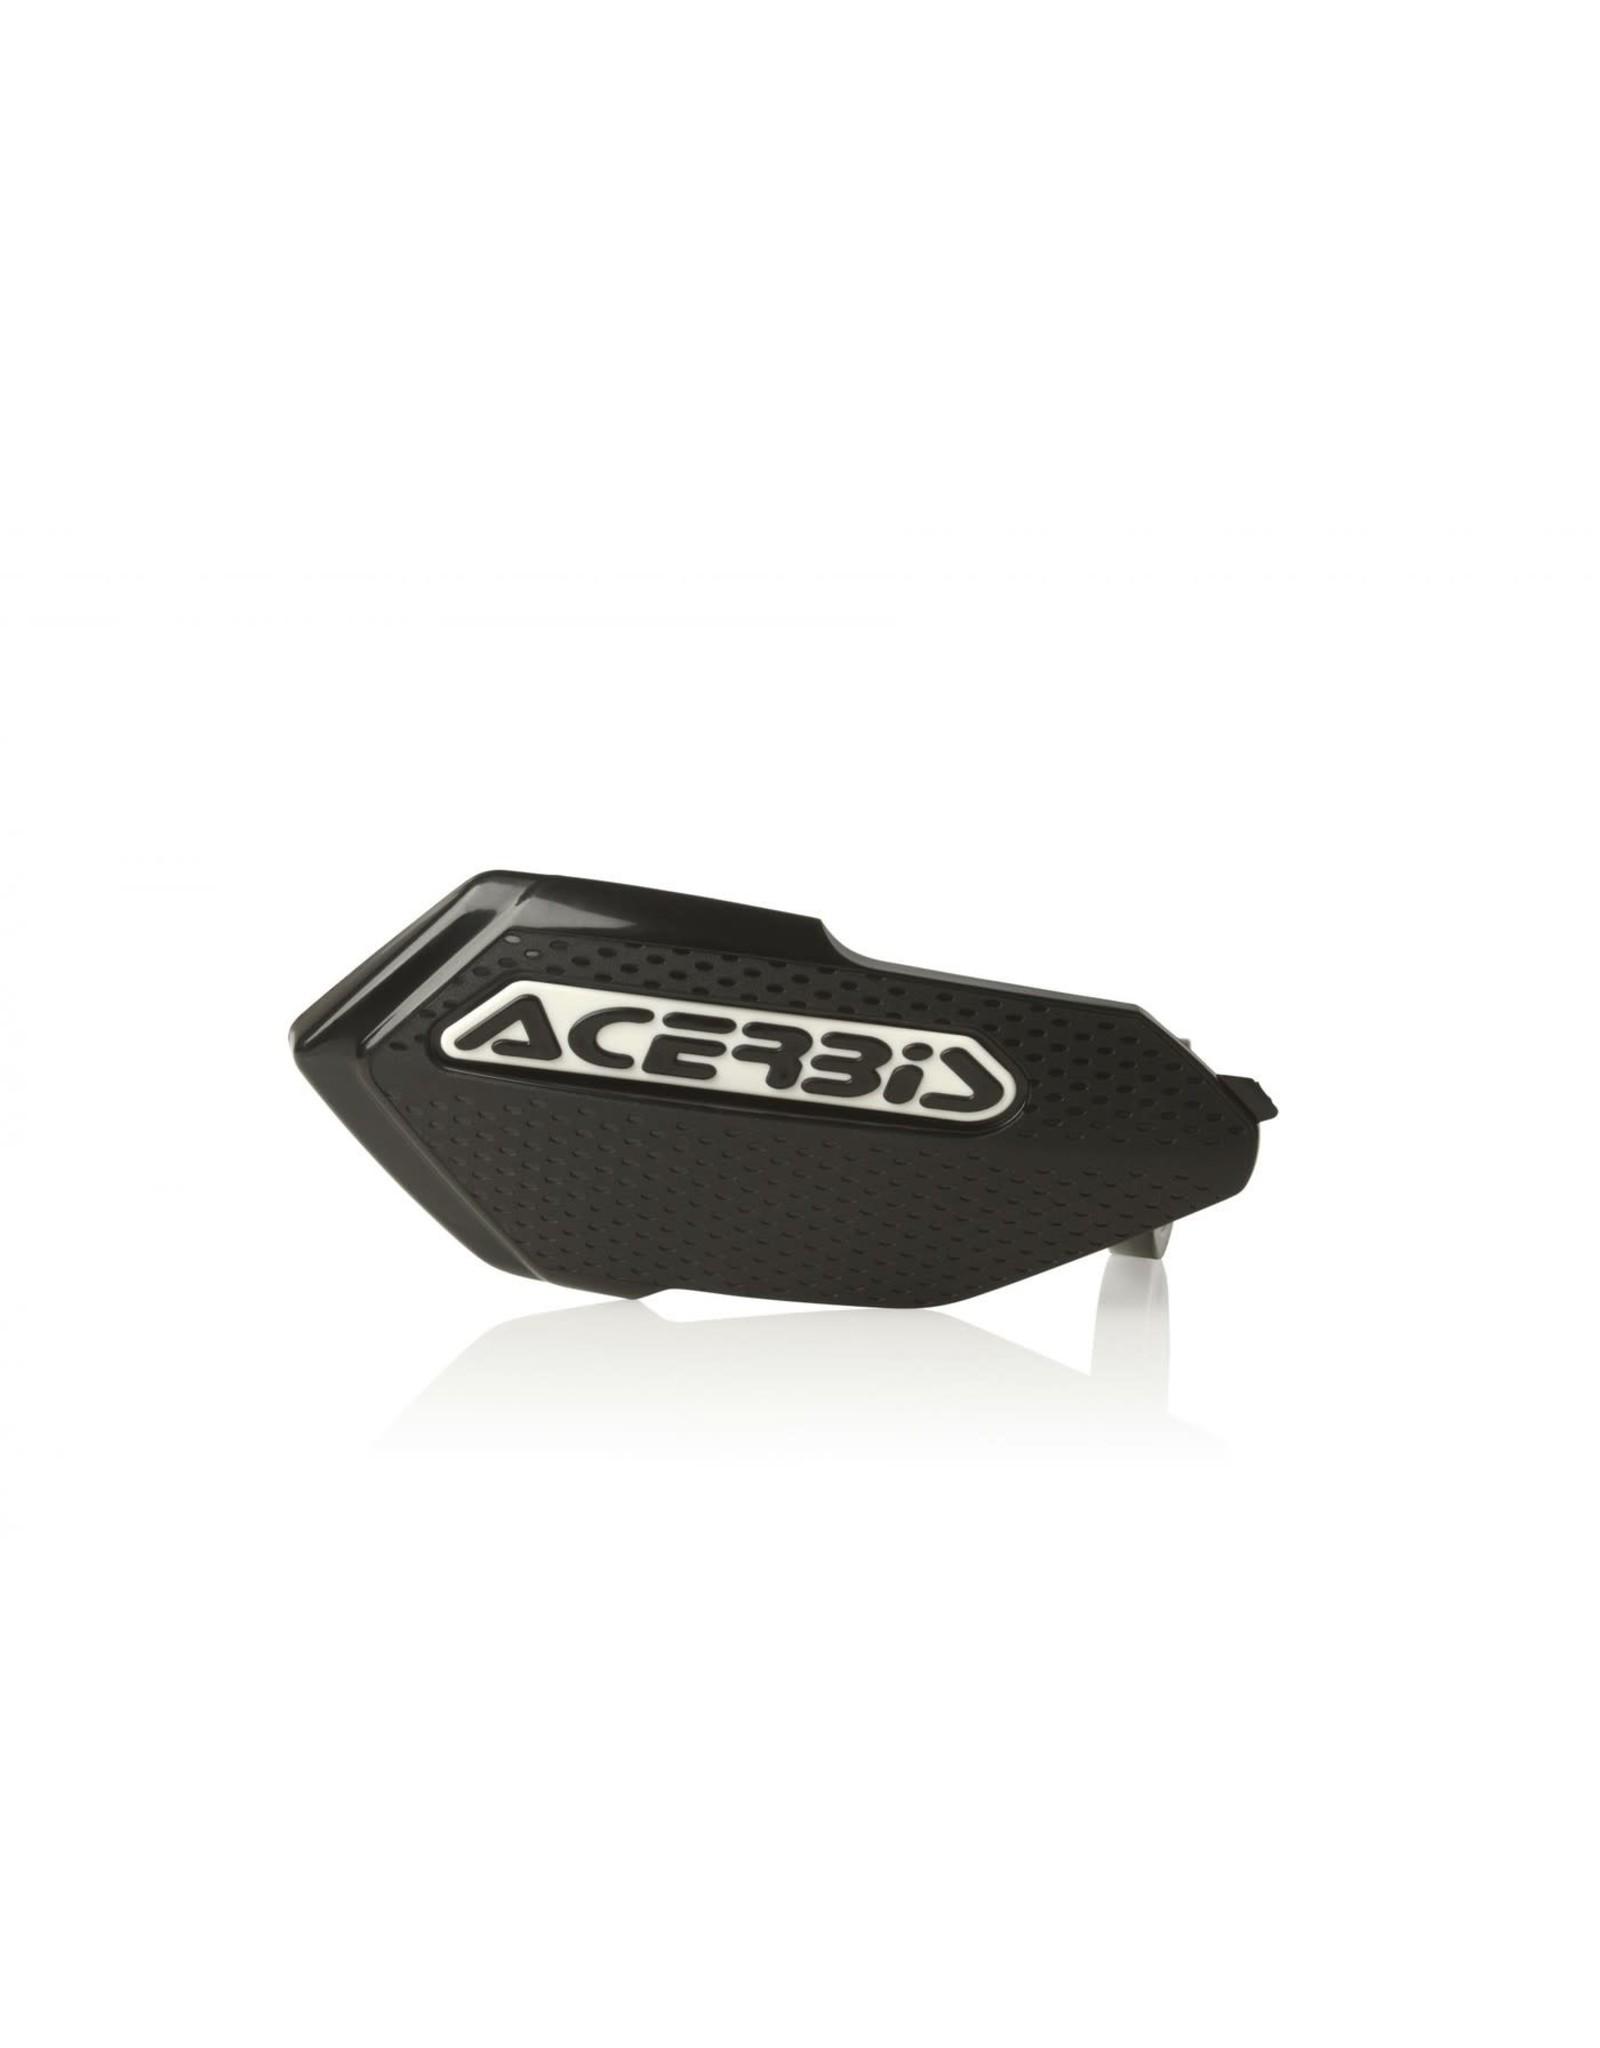 Acerbis Acerbis X-Elite Mountain Bike Handguards